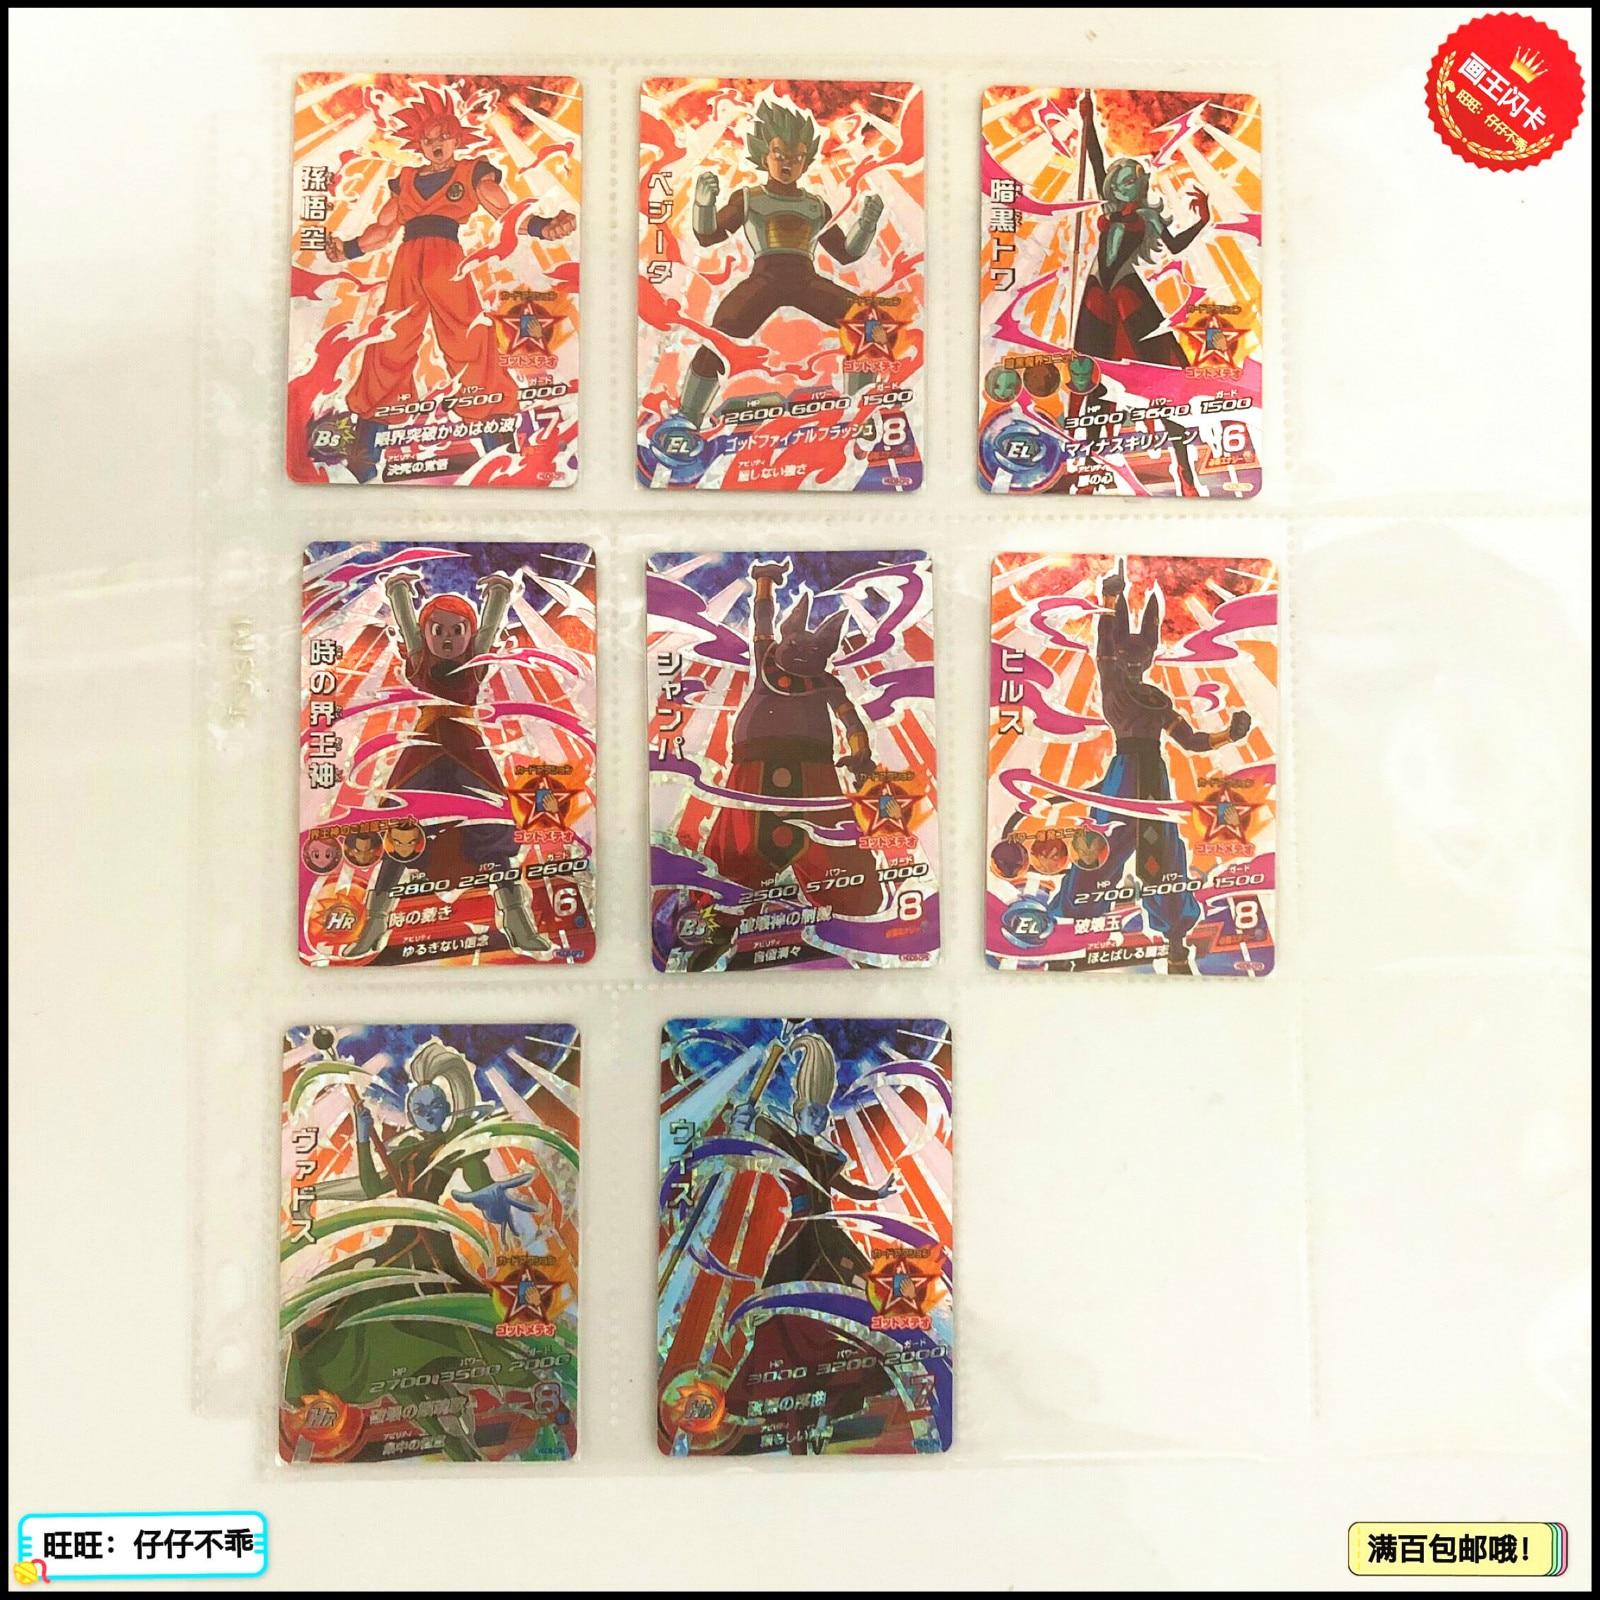 Japan Original Dragon Ball Hero Card HGD8 Goku God Of Creation Toys Hobbies Collectibles Game Collection Anime Cards